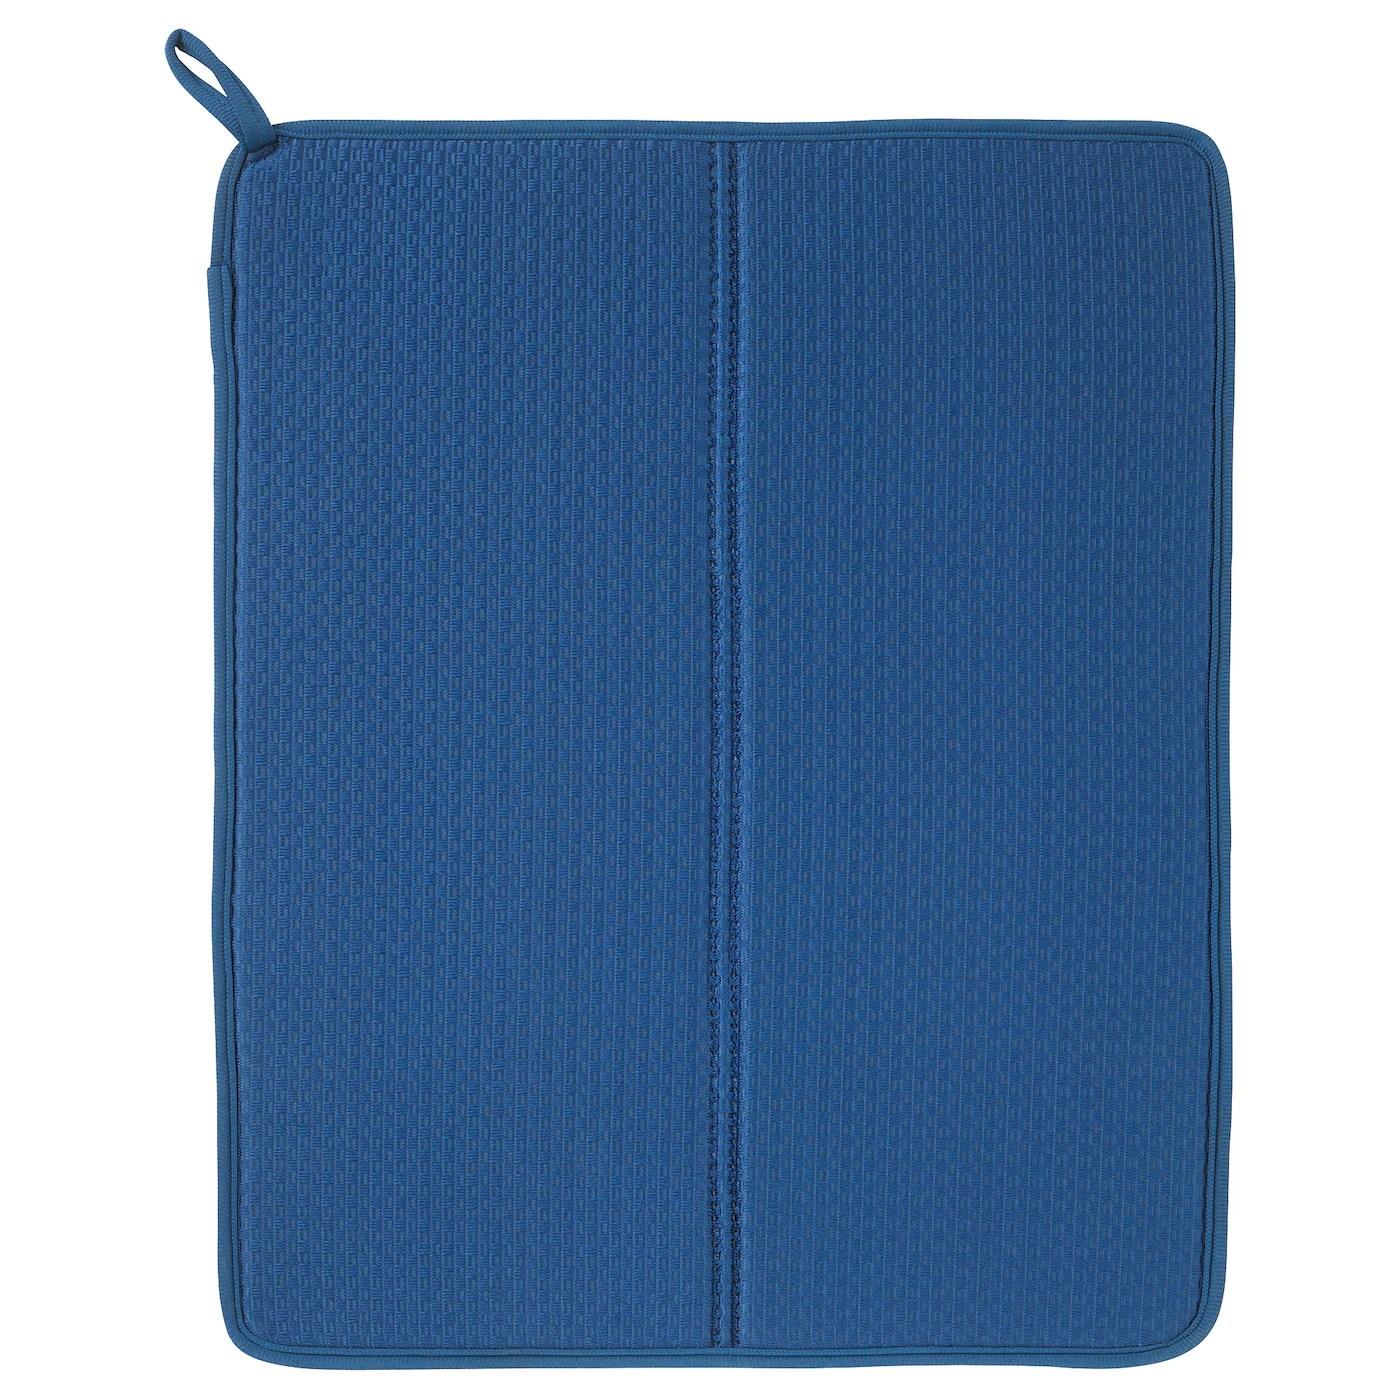 nyskoljd tapis sechage vaisselle bleu 44x36 cm